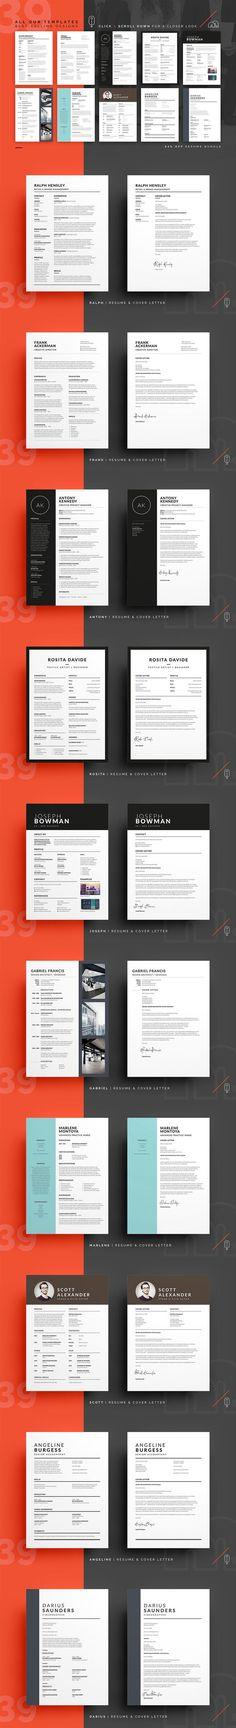 New Design Book Cover Resume Cv 29 Ideas Cv Cover Letter, Cover Letter Template, Letter Templates, Card Templates, Bookmark Template, Cv Template, Book Cover Design, Book Design, Design Typography